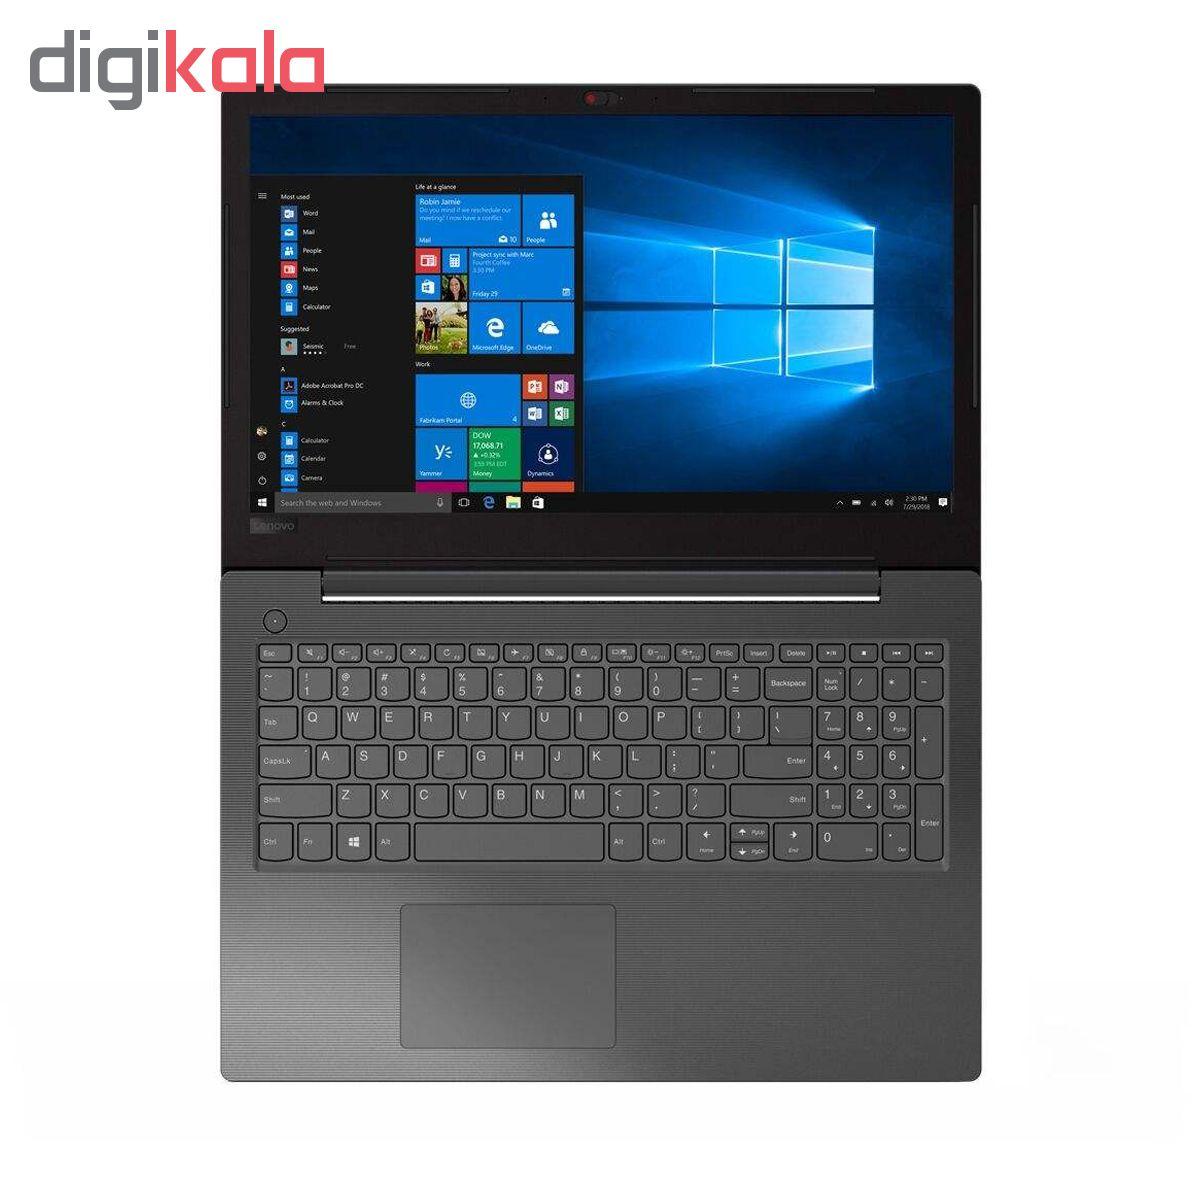 لپ تاپ 15 اینچی لنوو مدل Ideapad 330 - DB main 1 3